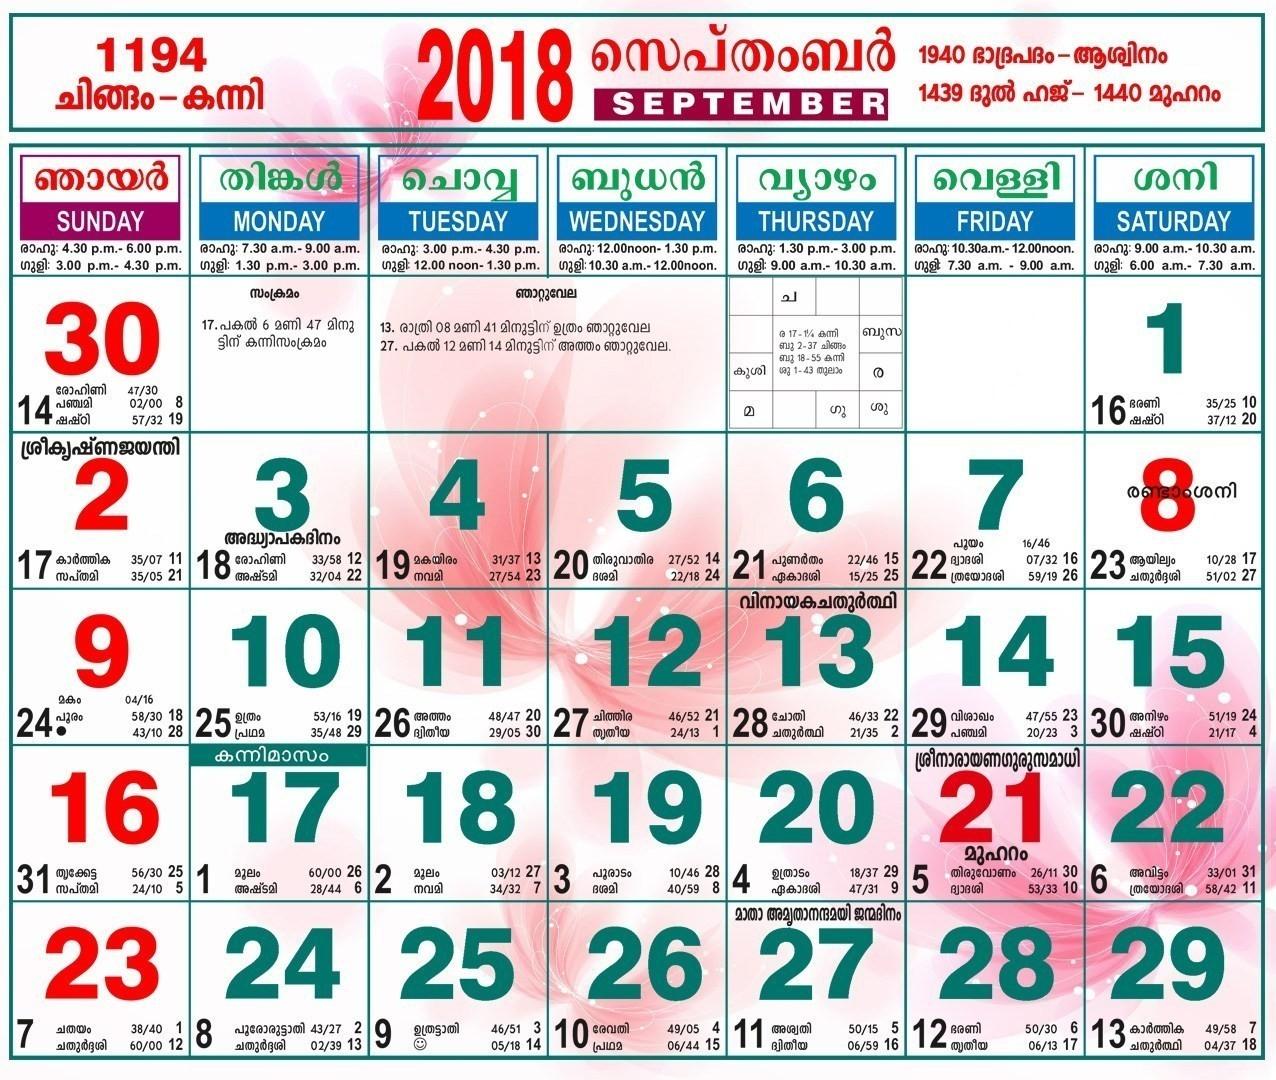 Dqnaywruqaalpsv 15 Calendar Of 1996 | Lankafuntrip  1996 August 29 Malayalam Calendar